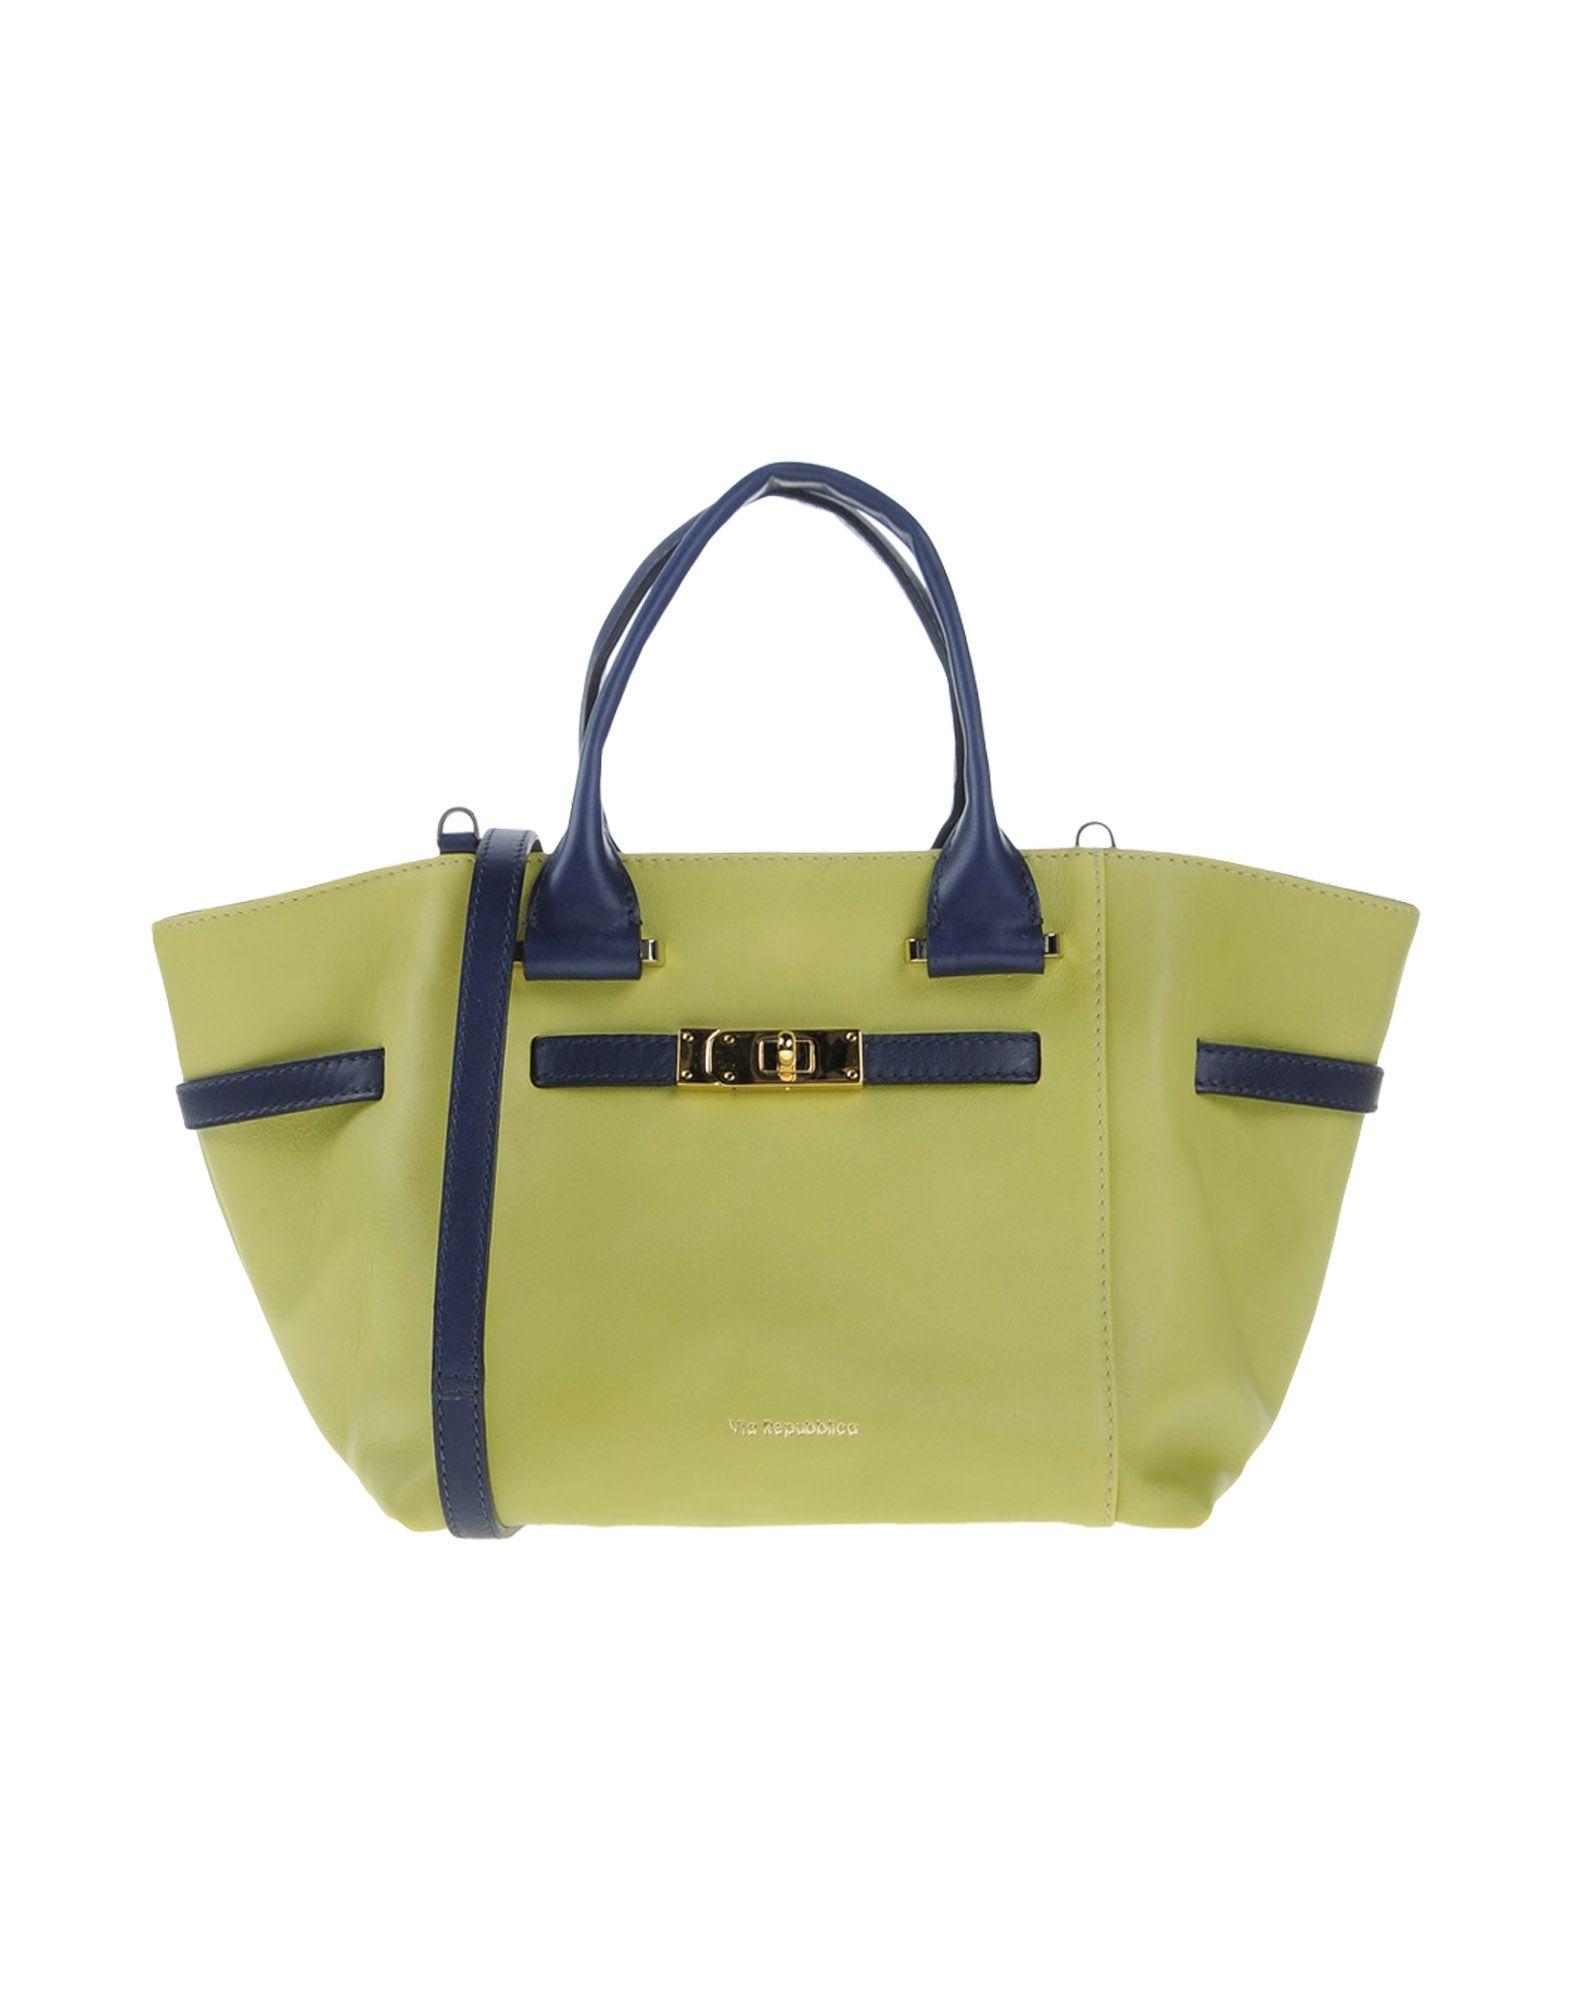 VIA REPUBBLICA Handbags